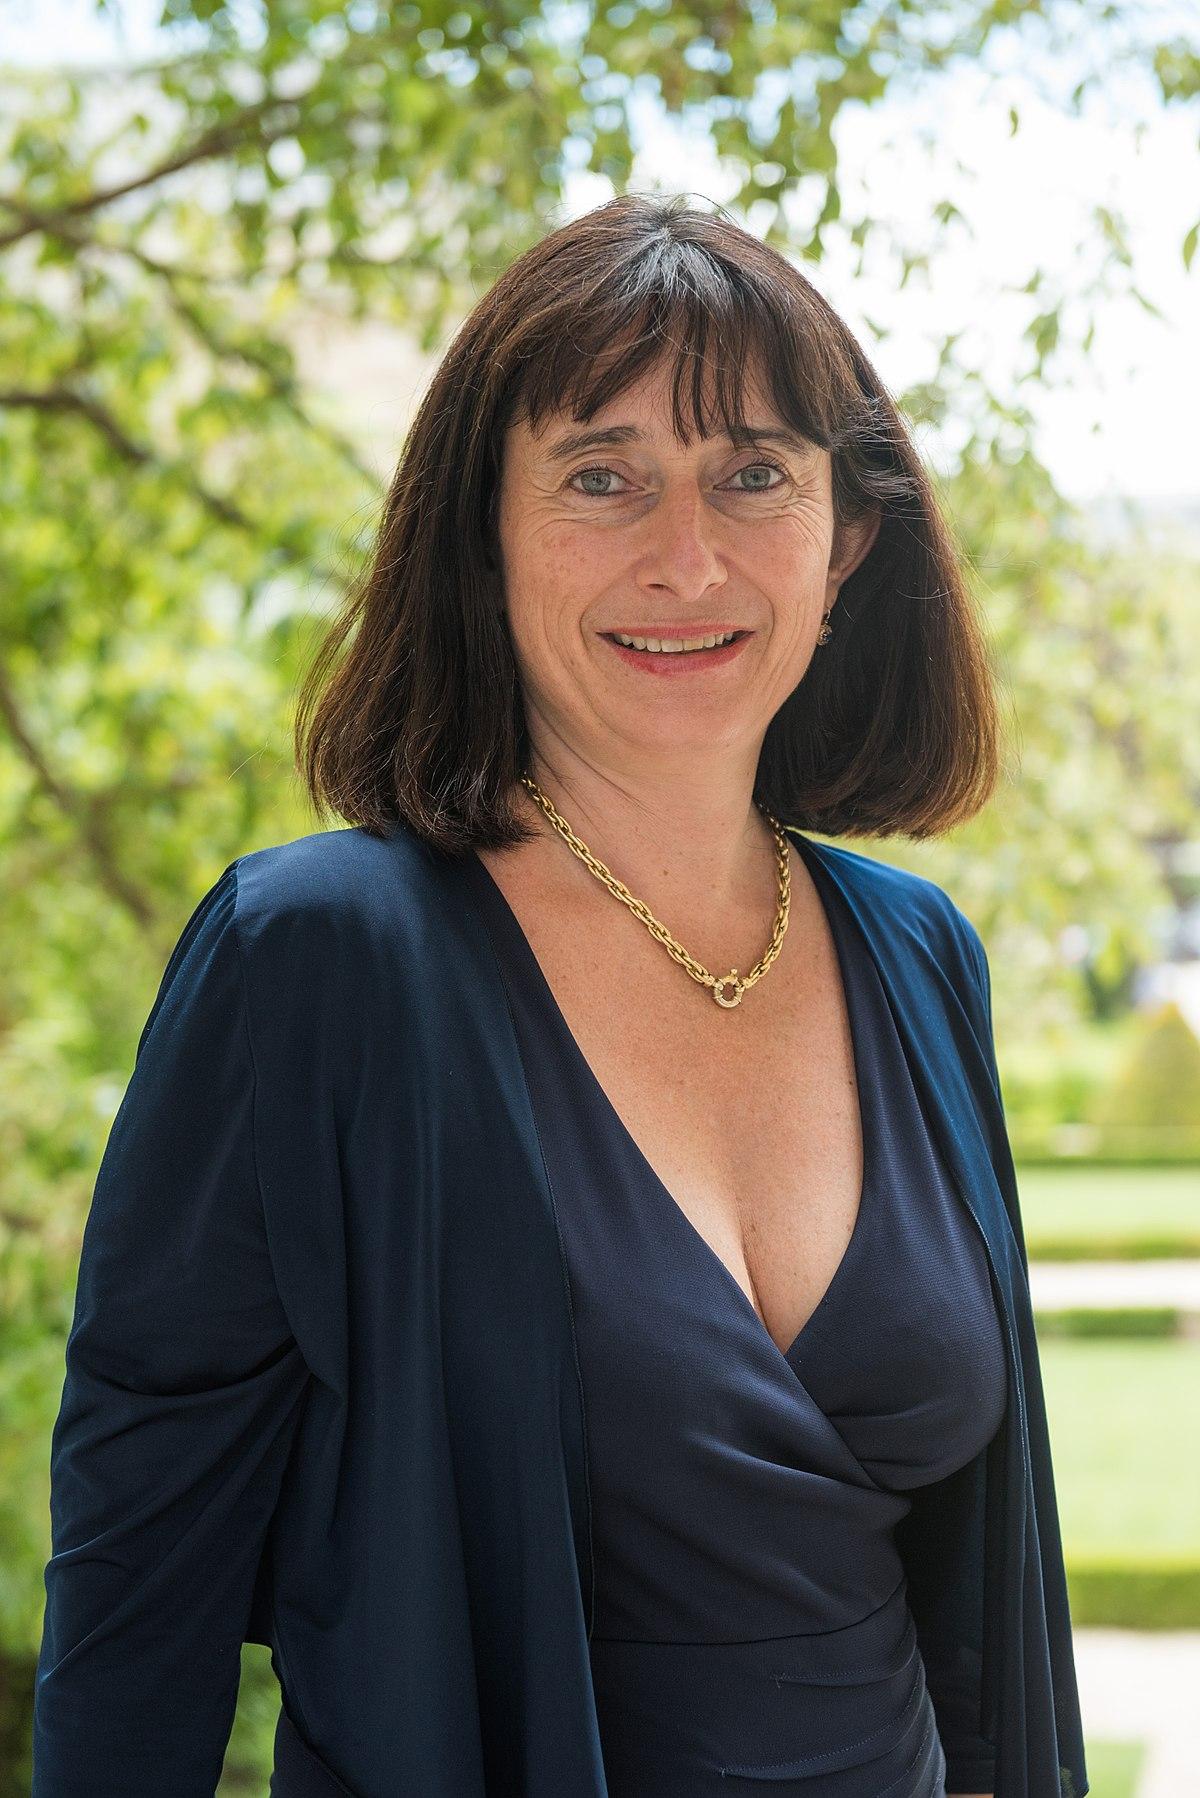 Laurence Trastour Isnart Wikipedia